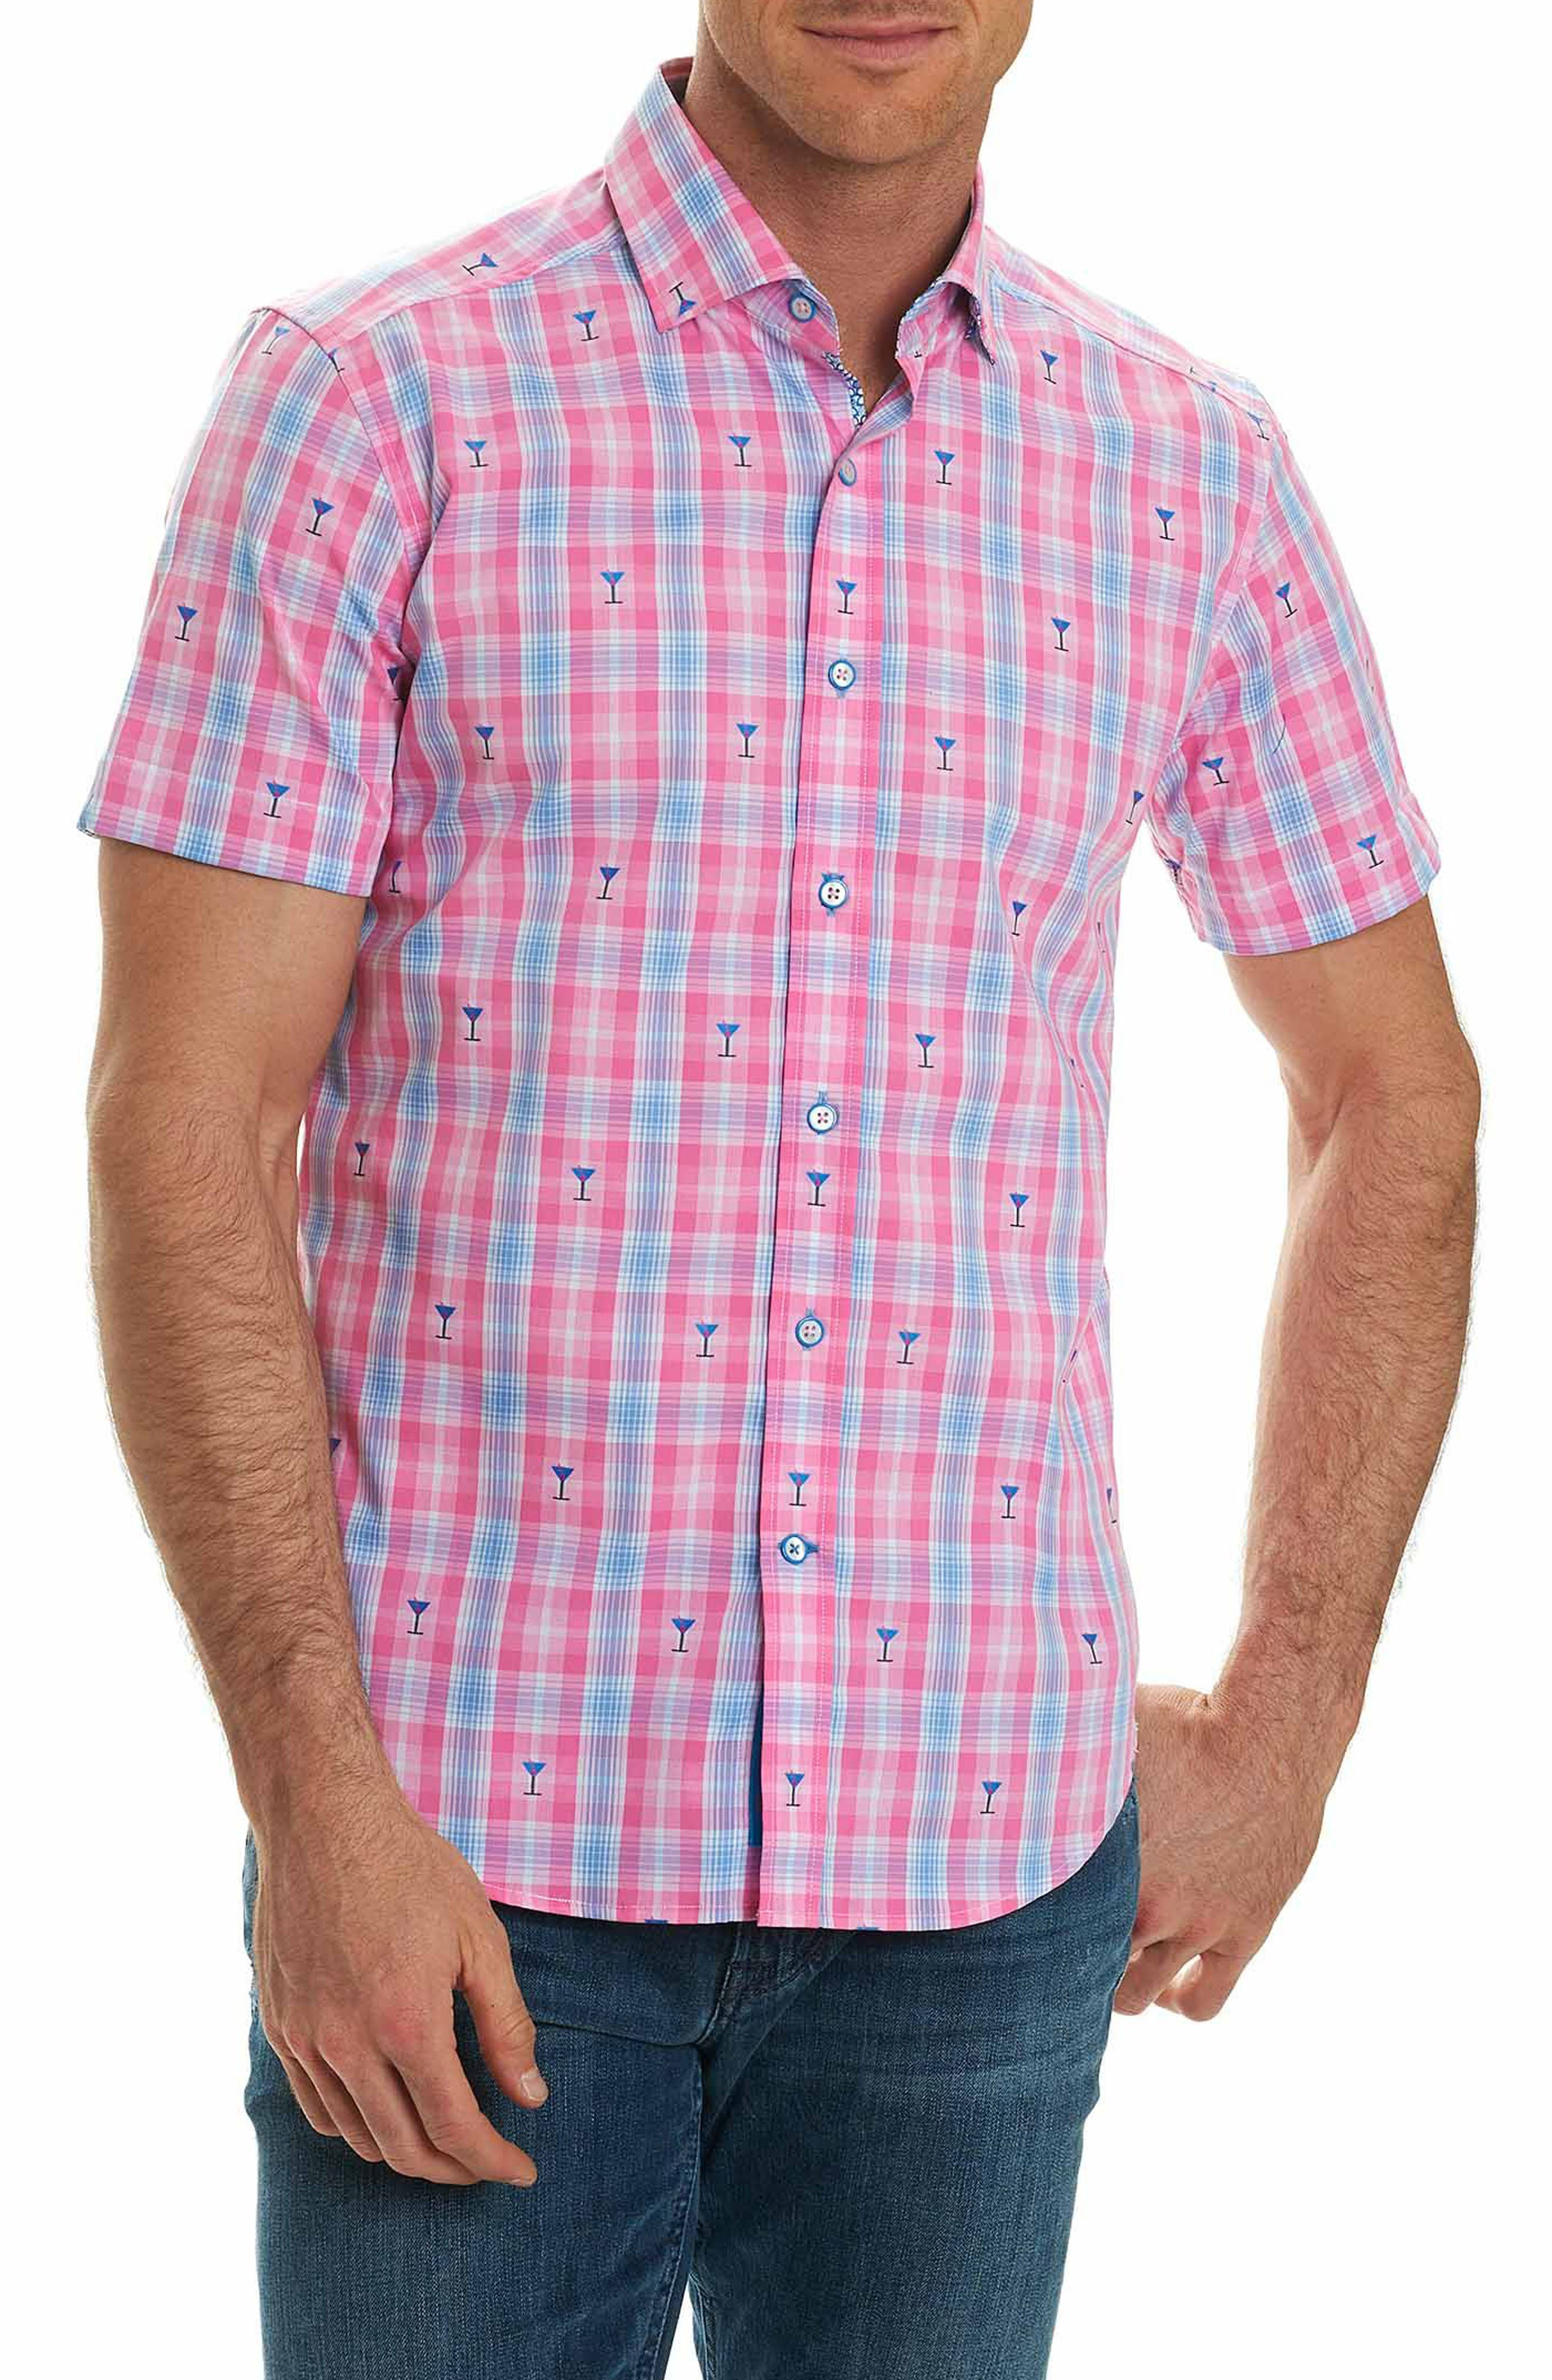 Alternate Image 1 Selected - Robert Graham Chancellor Martini Plaid Sport Shirt